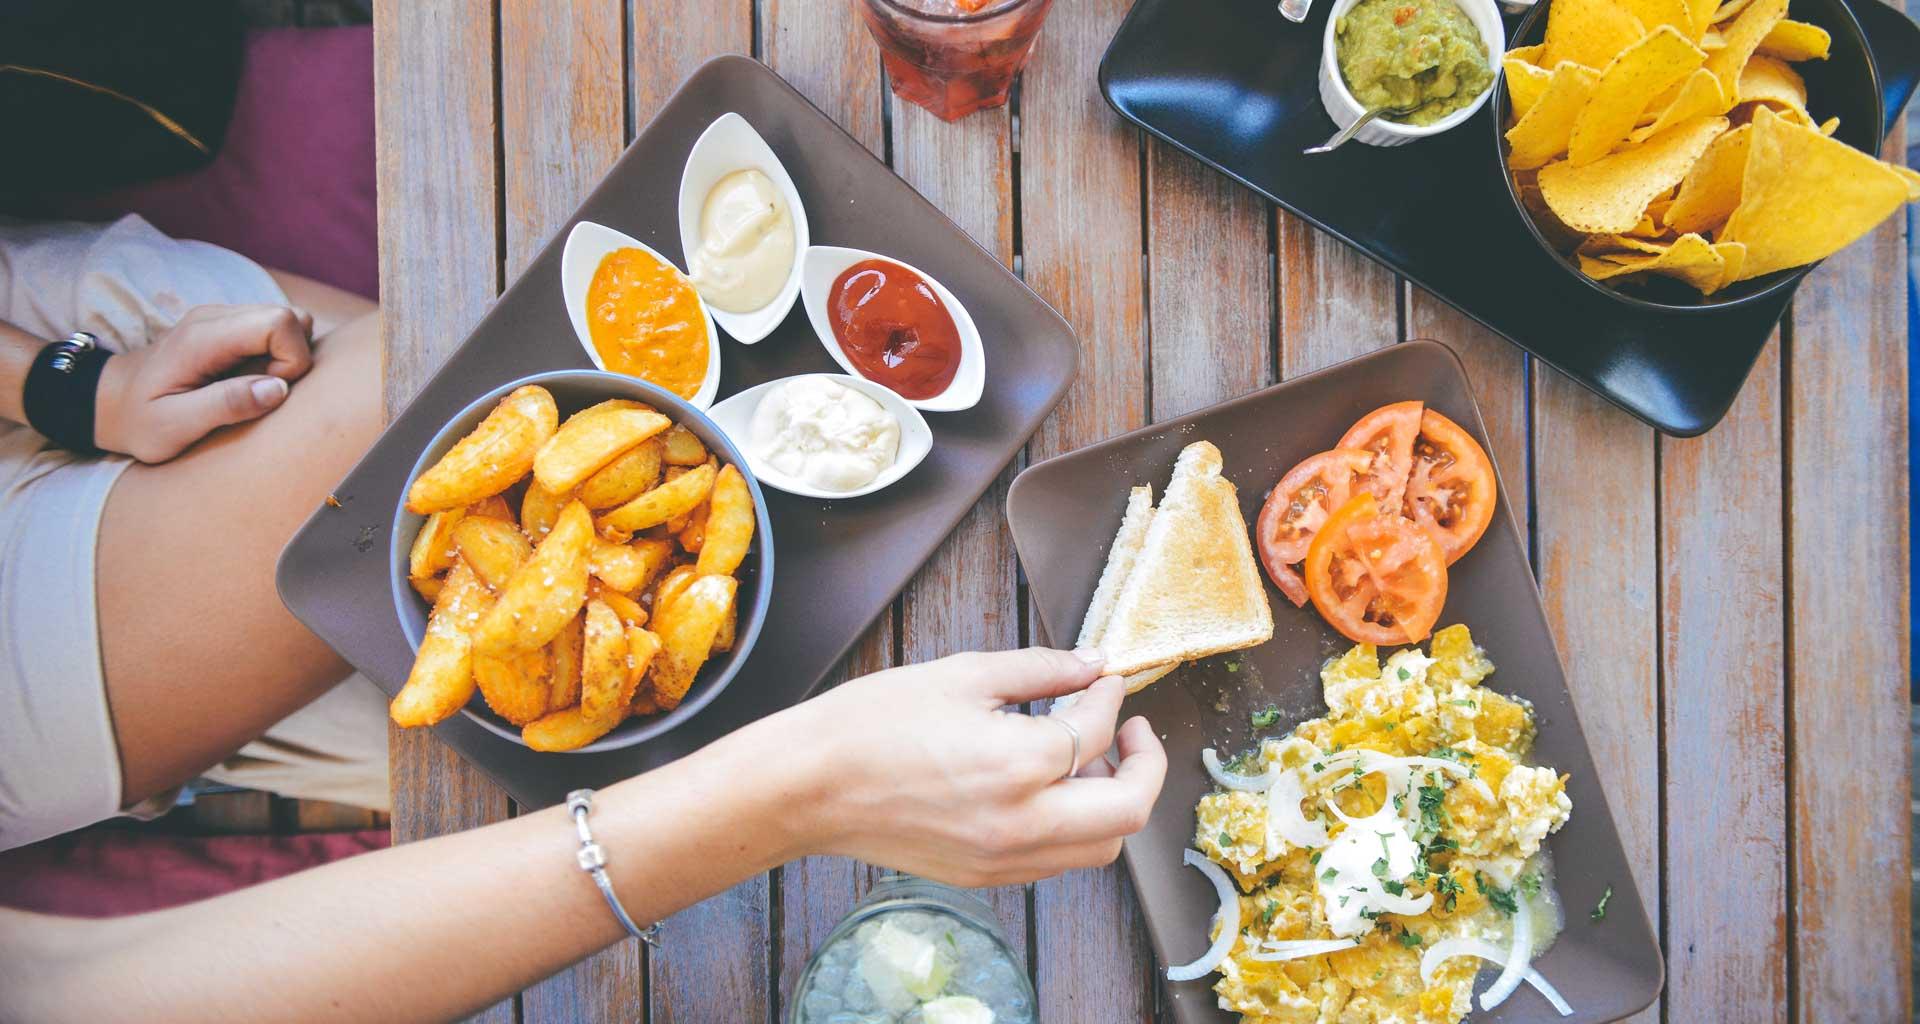 Freshly Premium Ingredients From Around The World